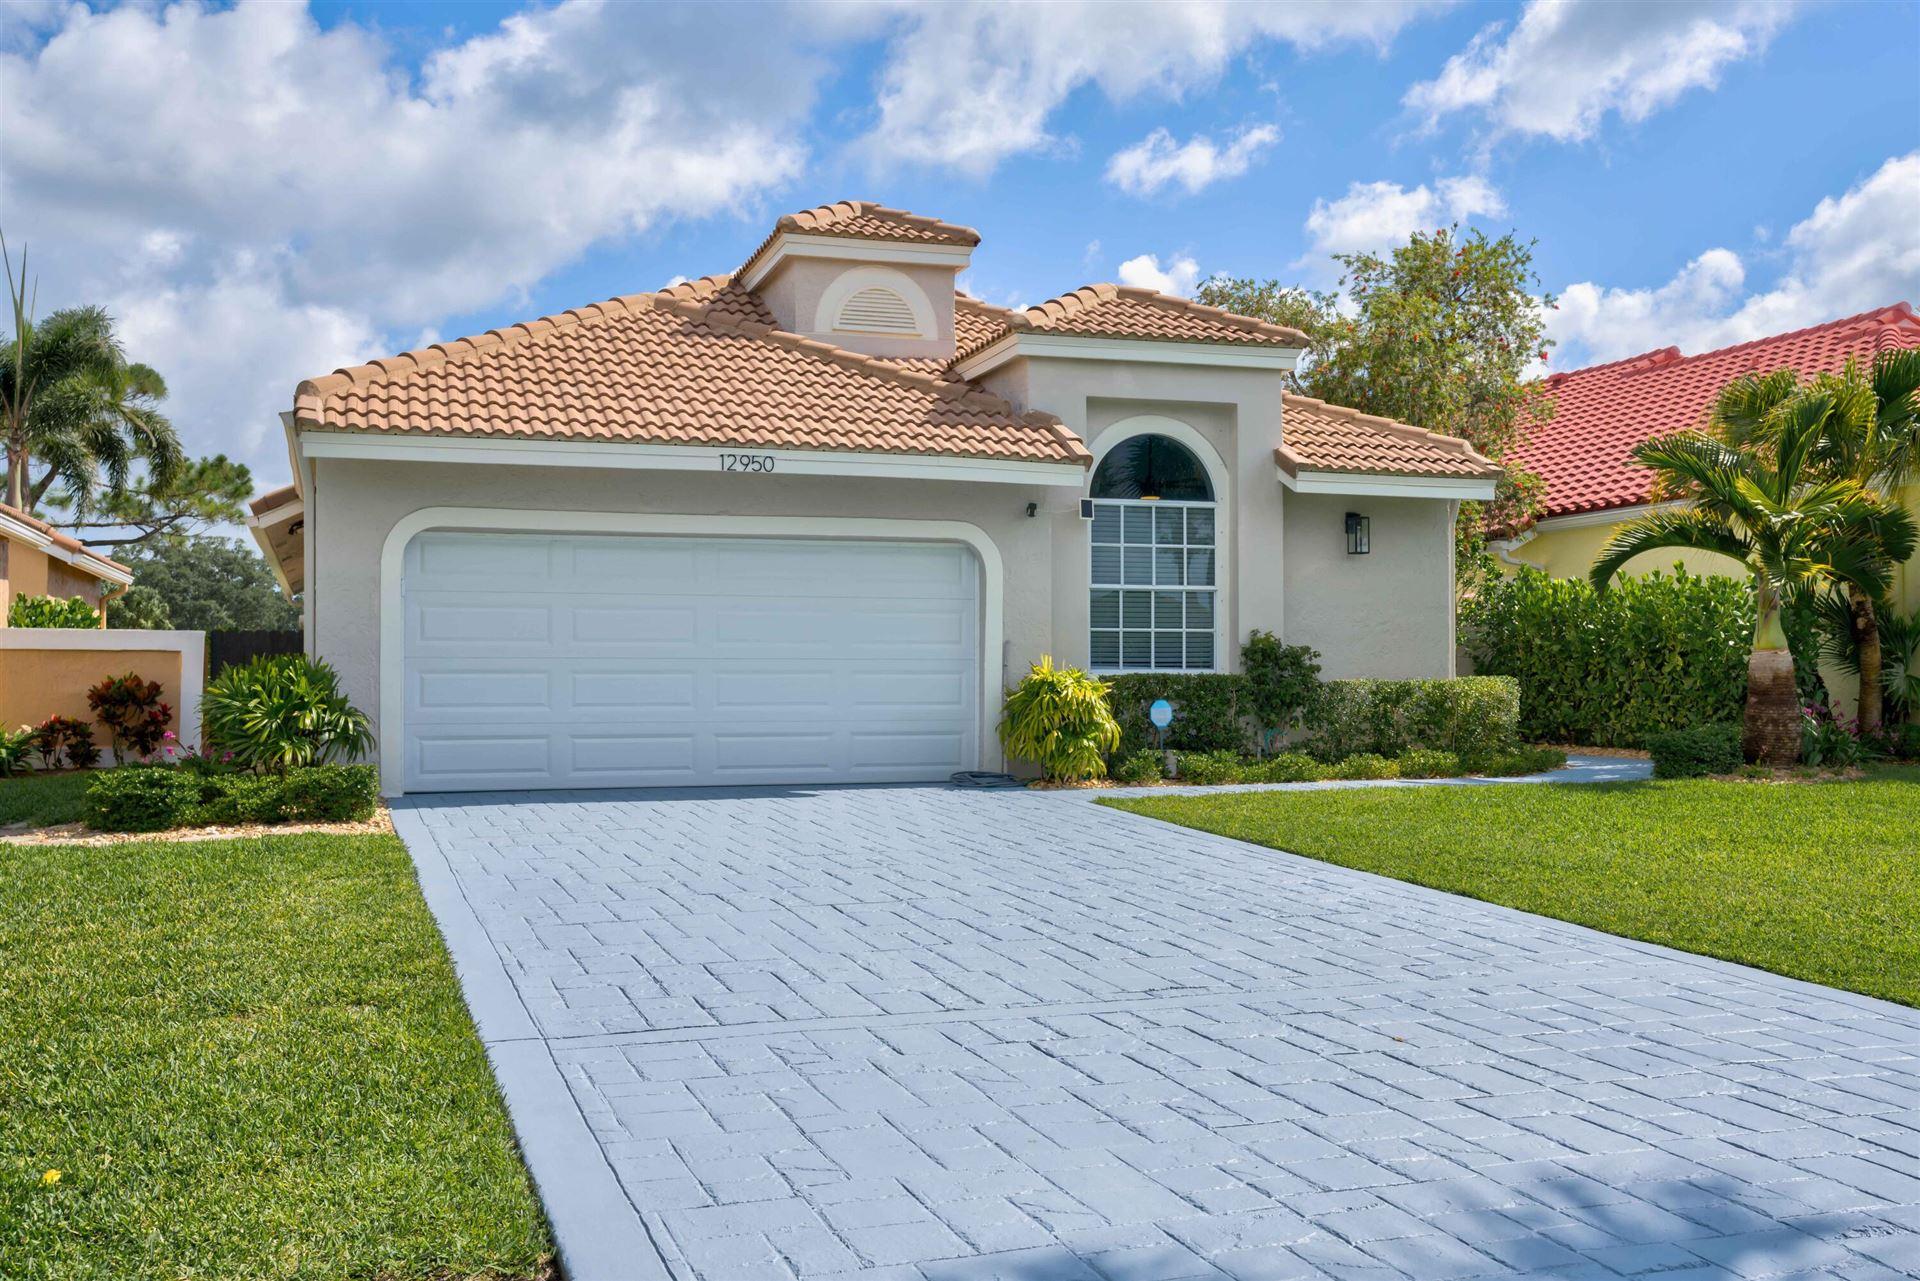 12950 Touchstone Place, West Palm Beach, FL 33418 - MLS#: RX-10723109